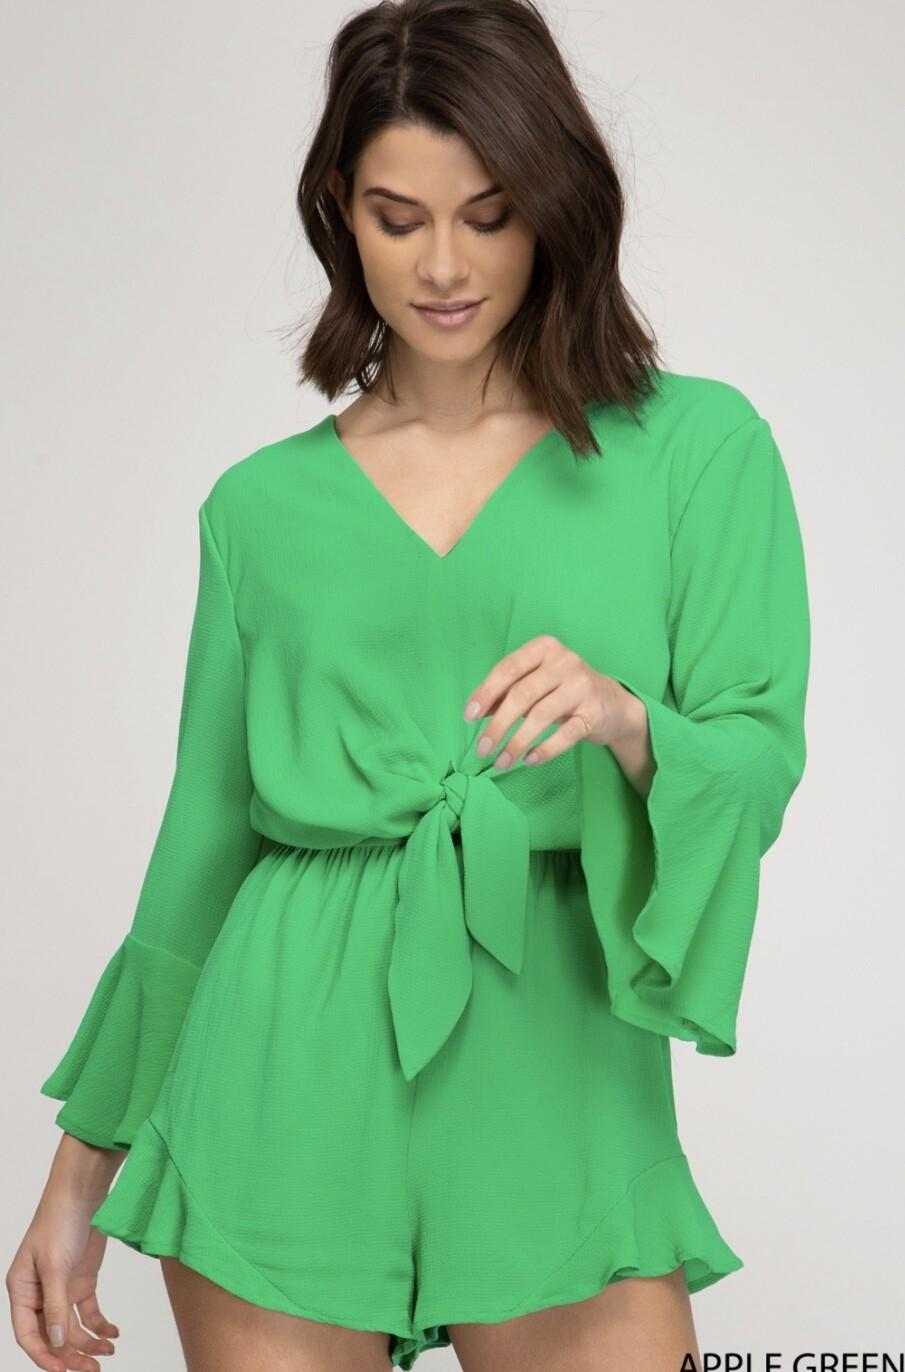 Romper Bell Sleeve Green Short